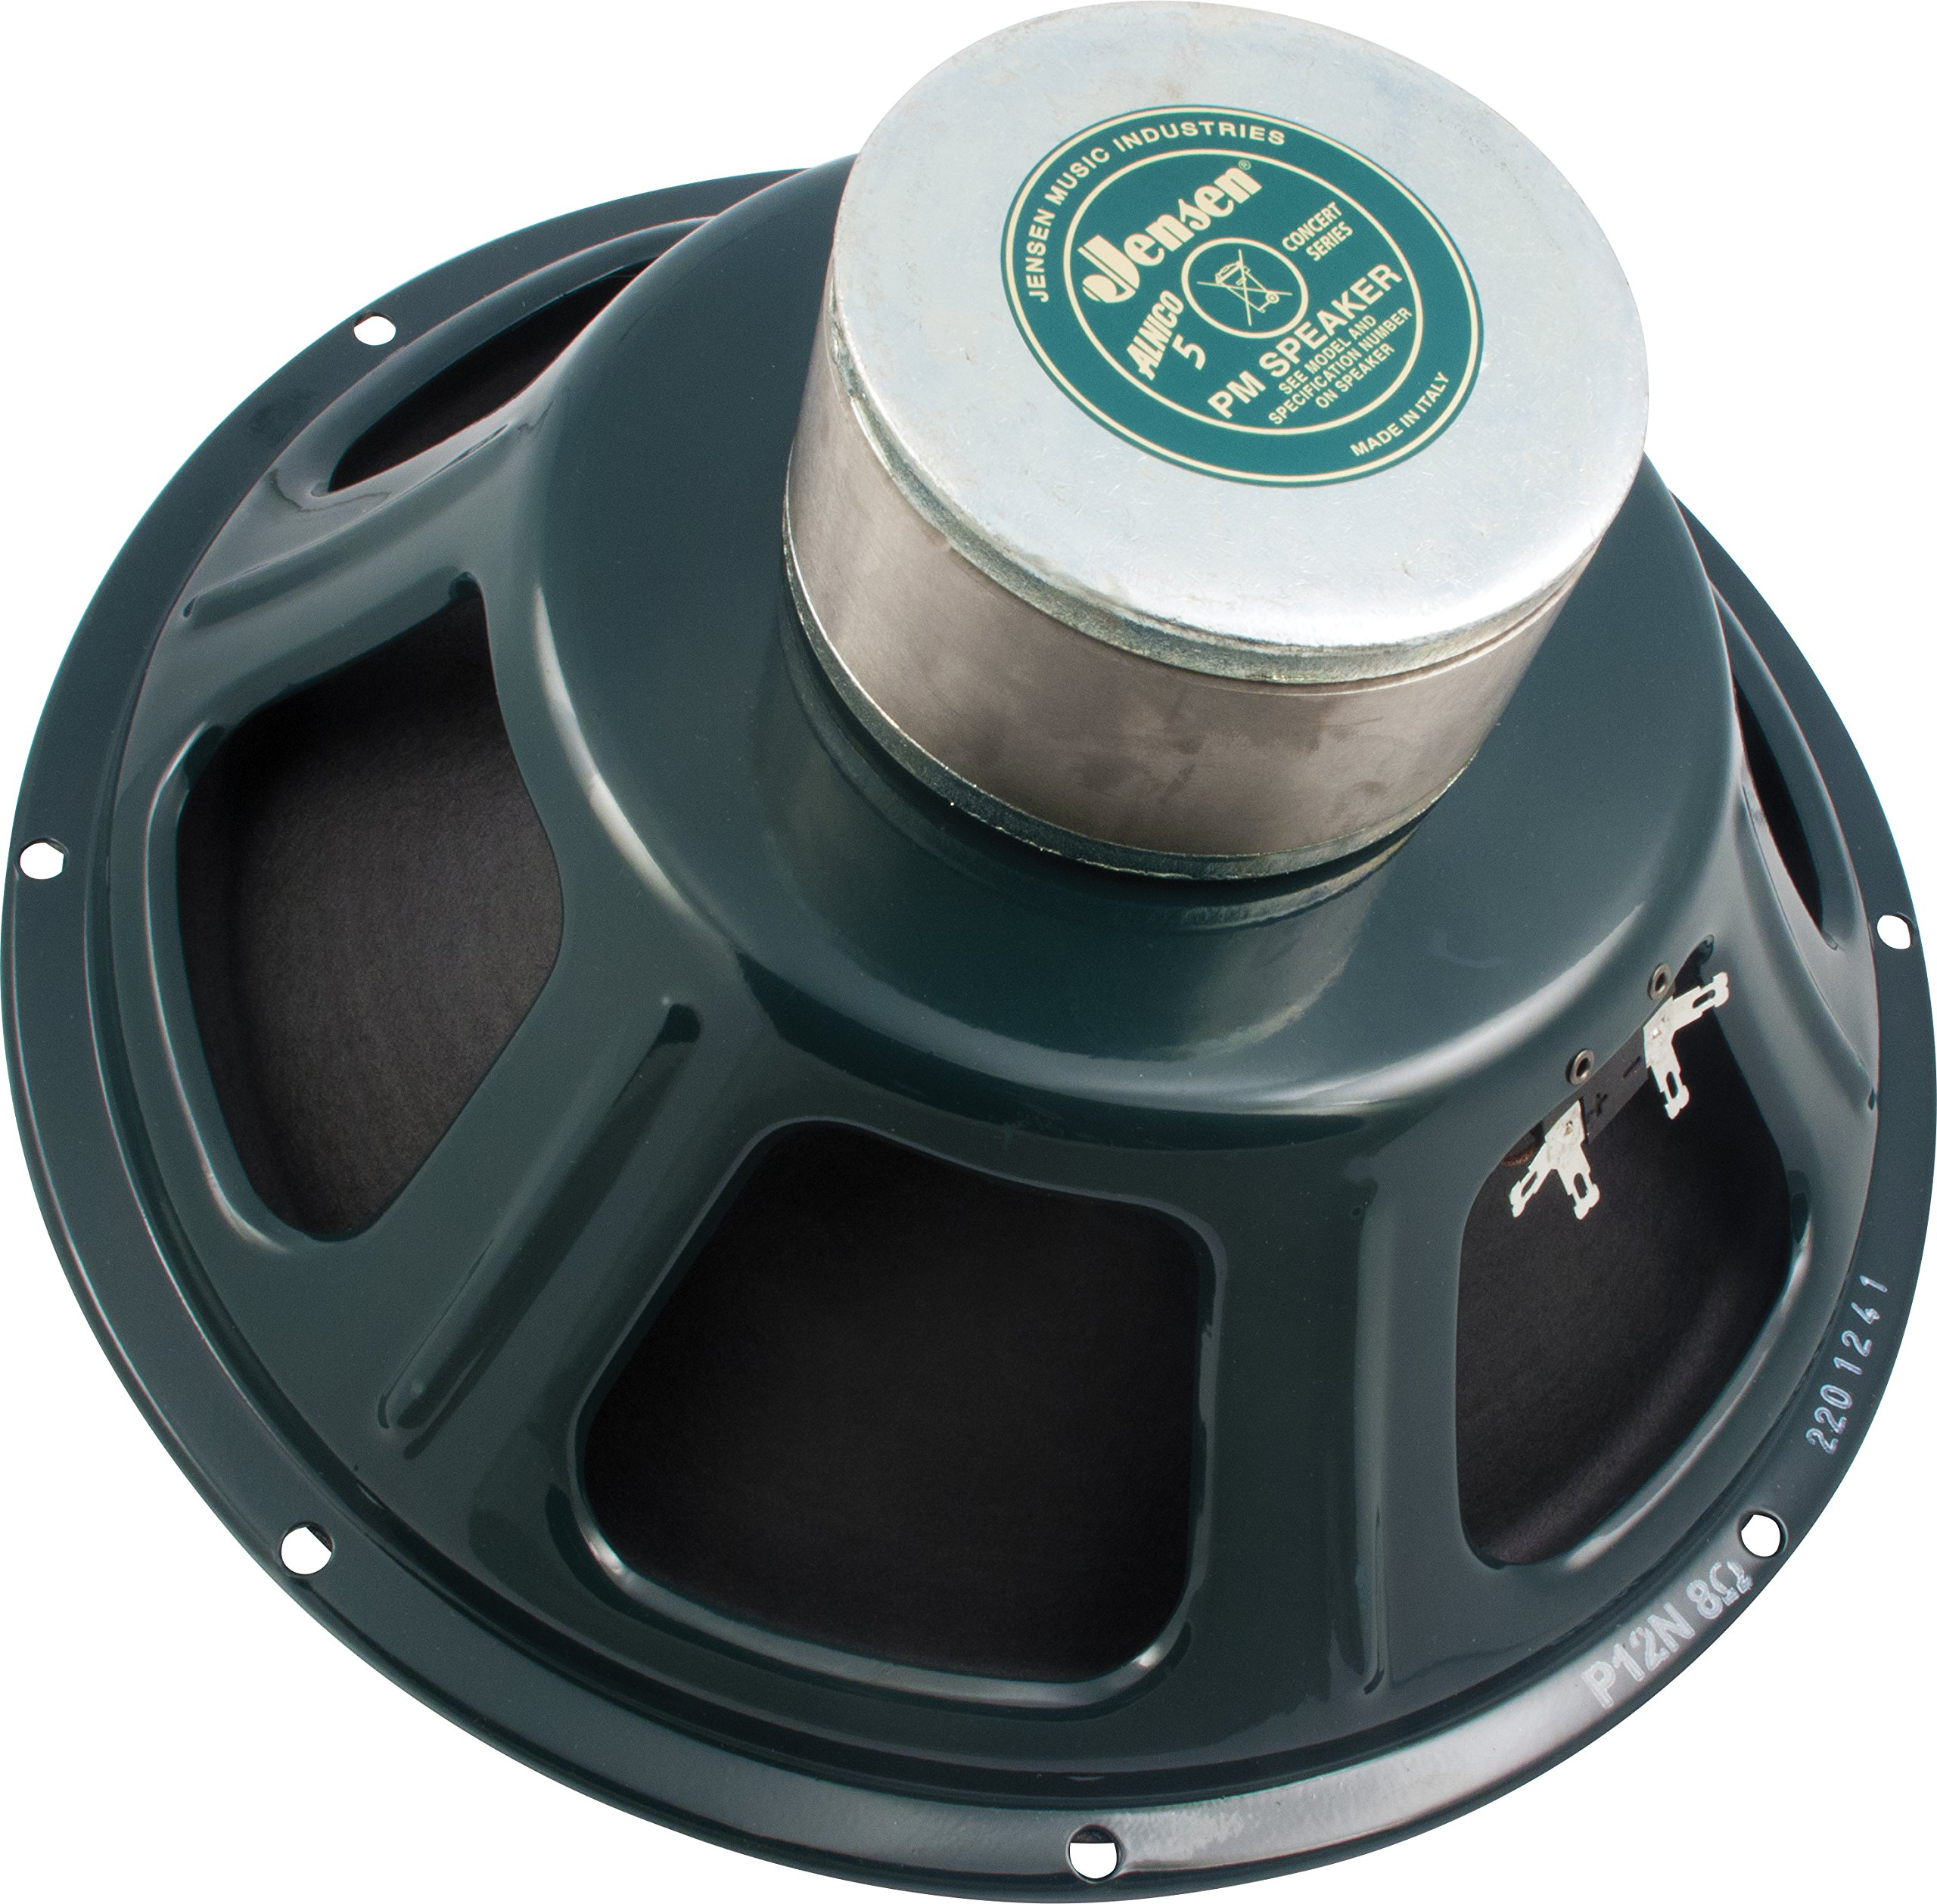 Jensen Vintage P12NNB8 12-Inch Alnico Speaker without  Bell, 8 ohm by Jensen